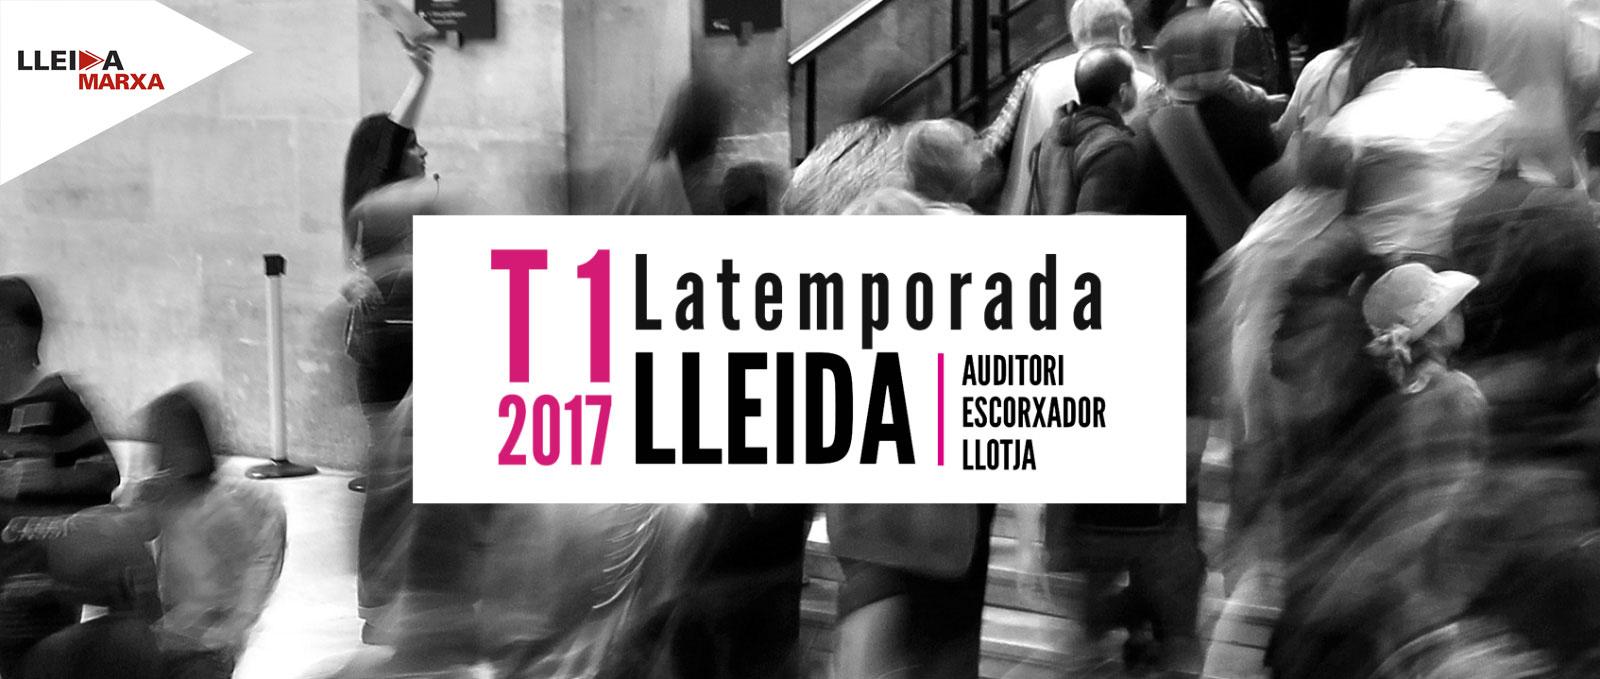 Latemporada Lleida 2017